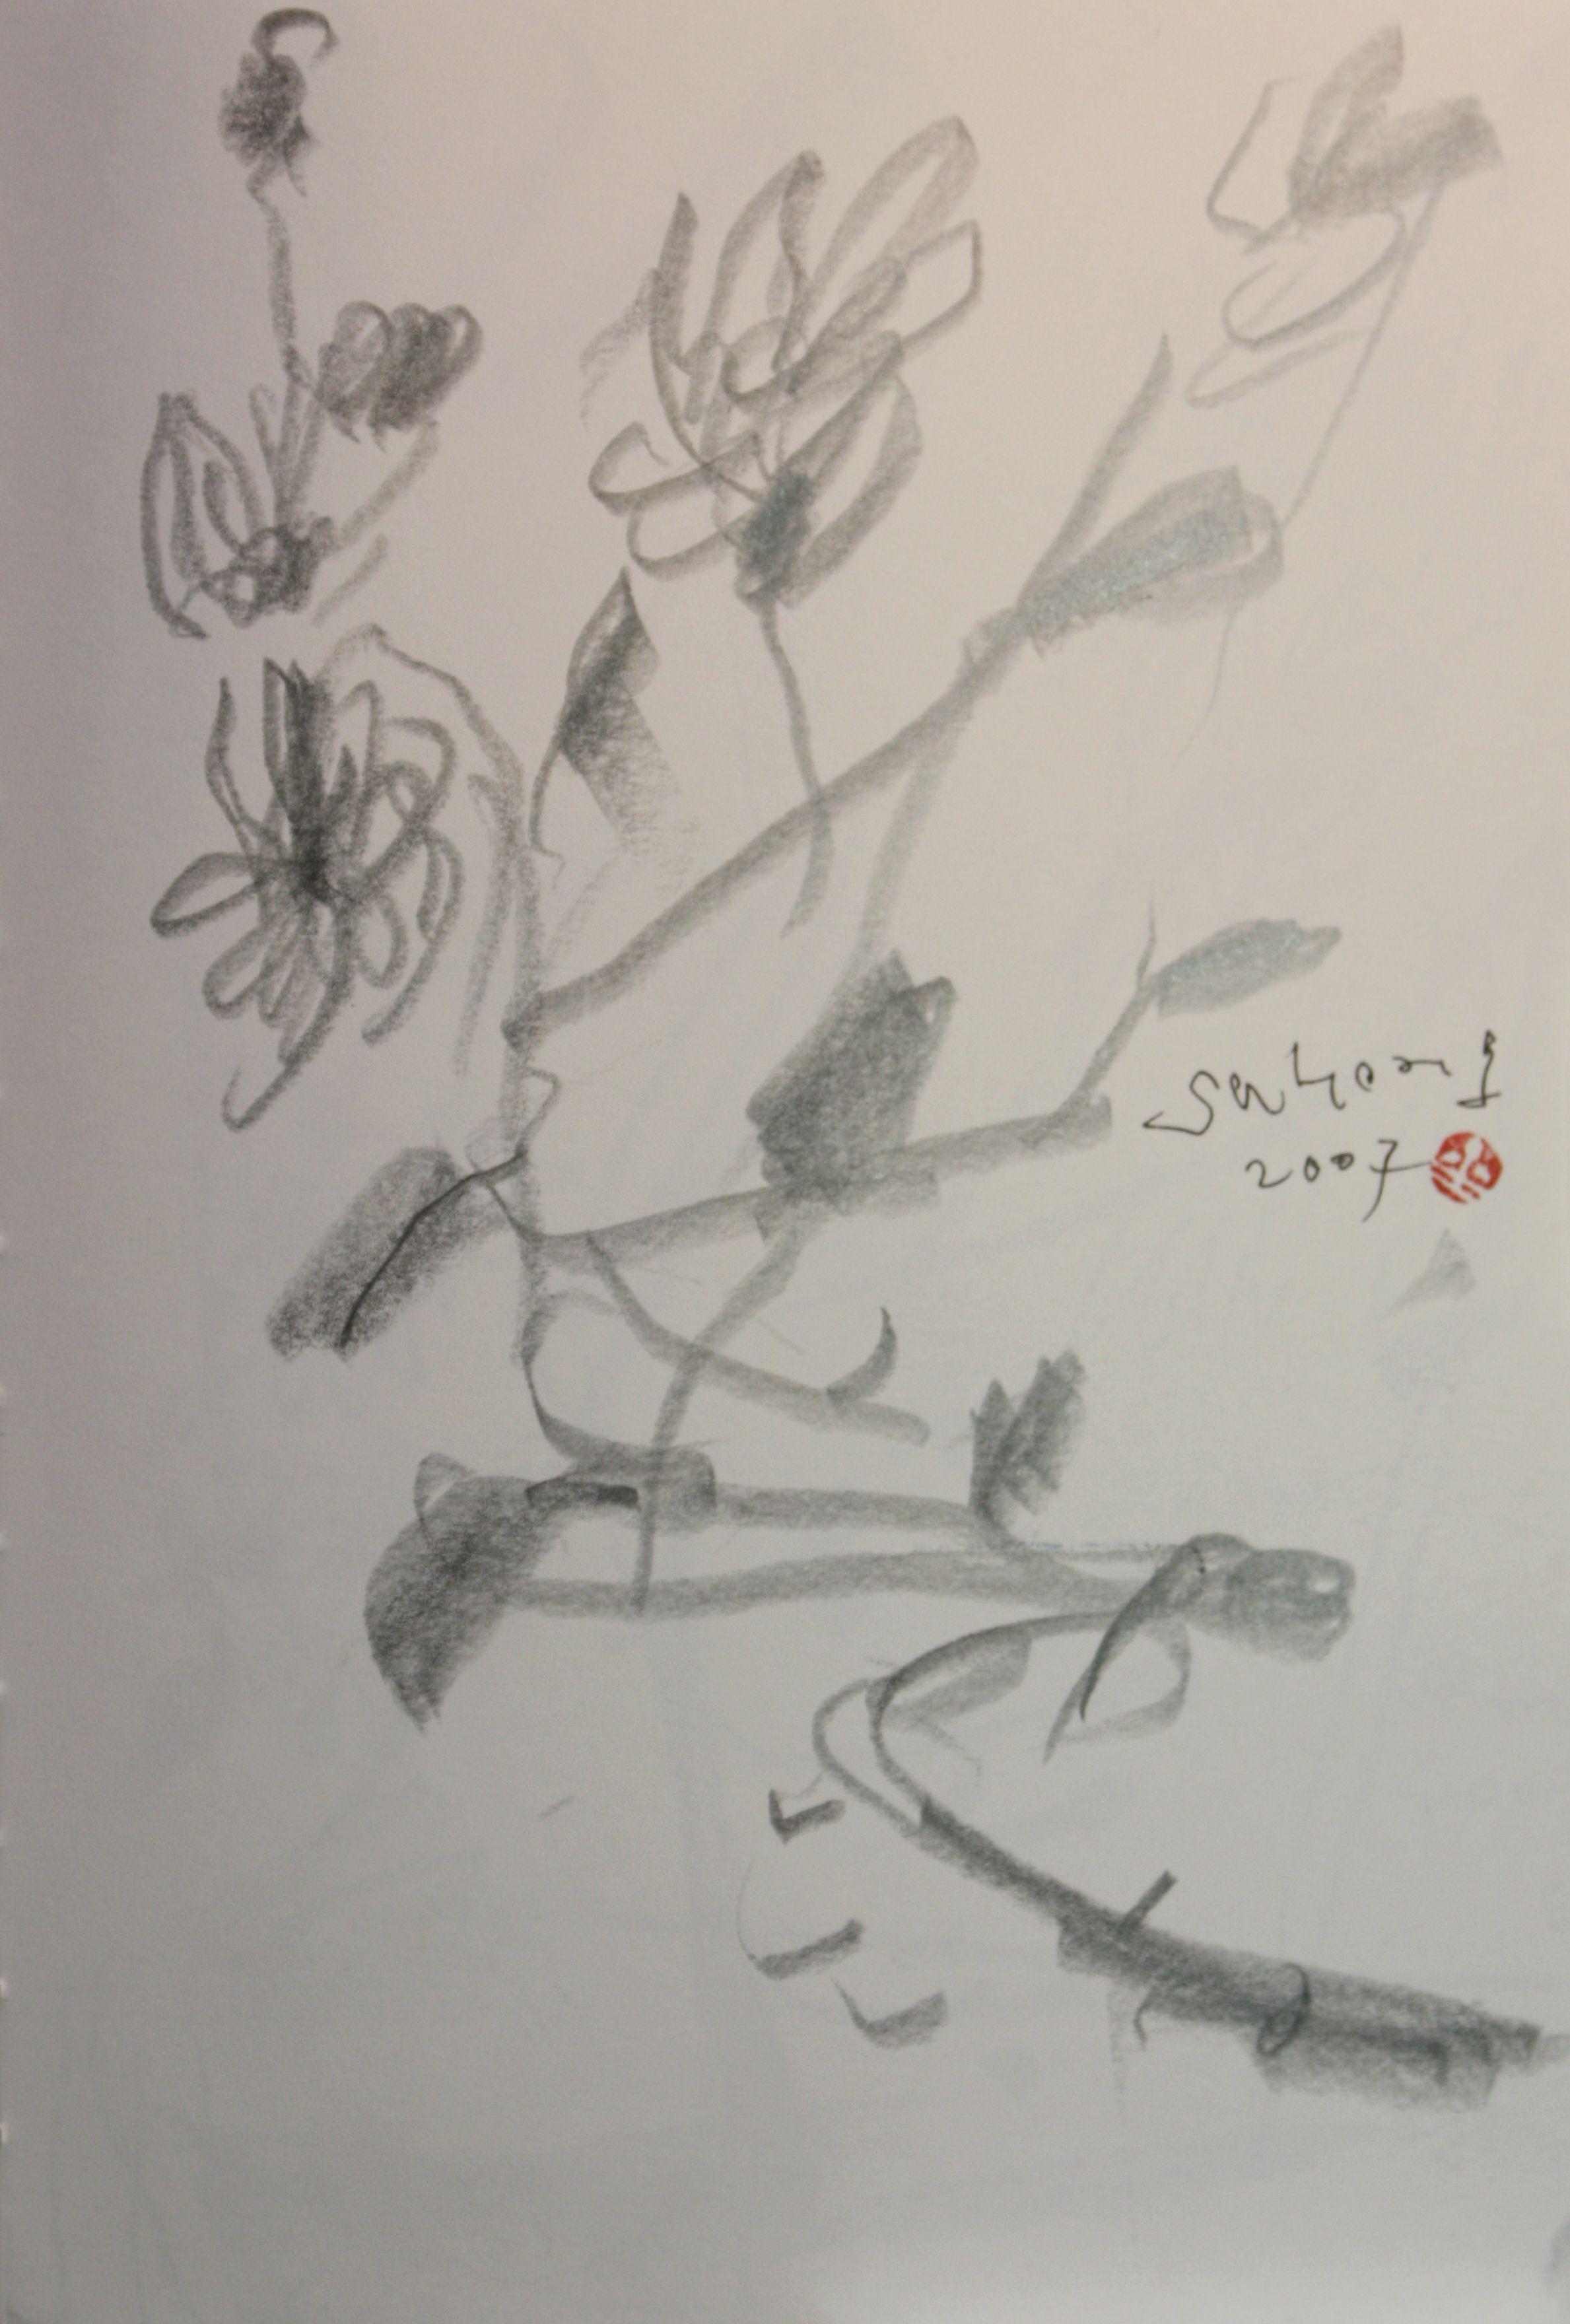 https://www.facebook.com/sahong.gum Drawing on Book, Gum-Sahong,금사홍,드로잉,북